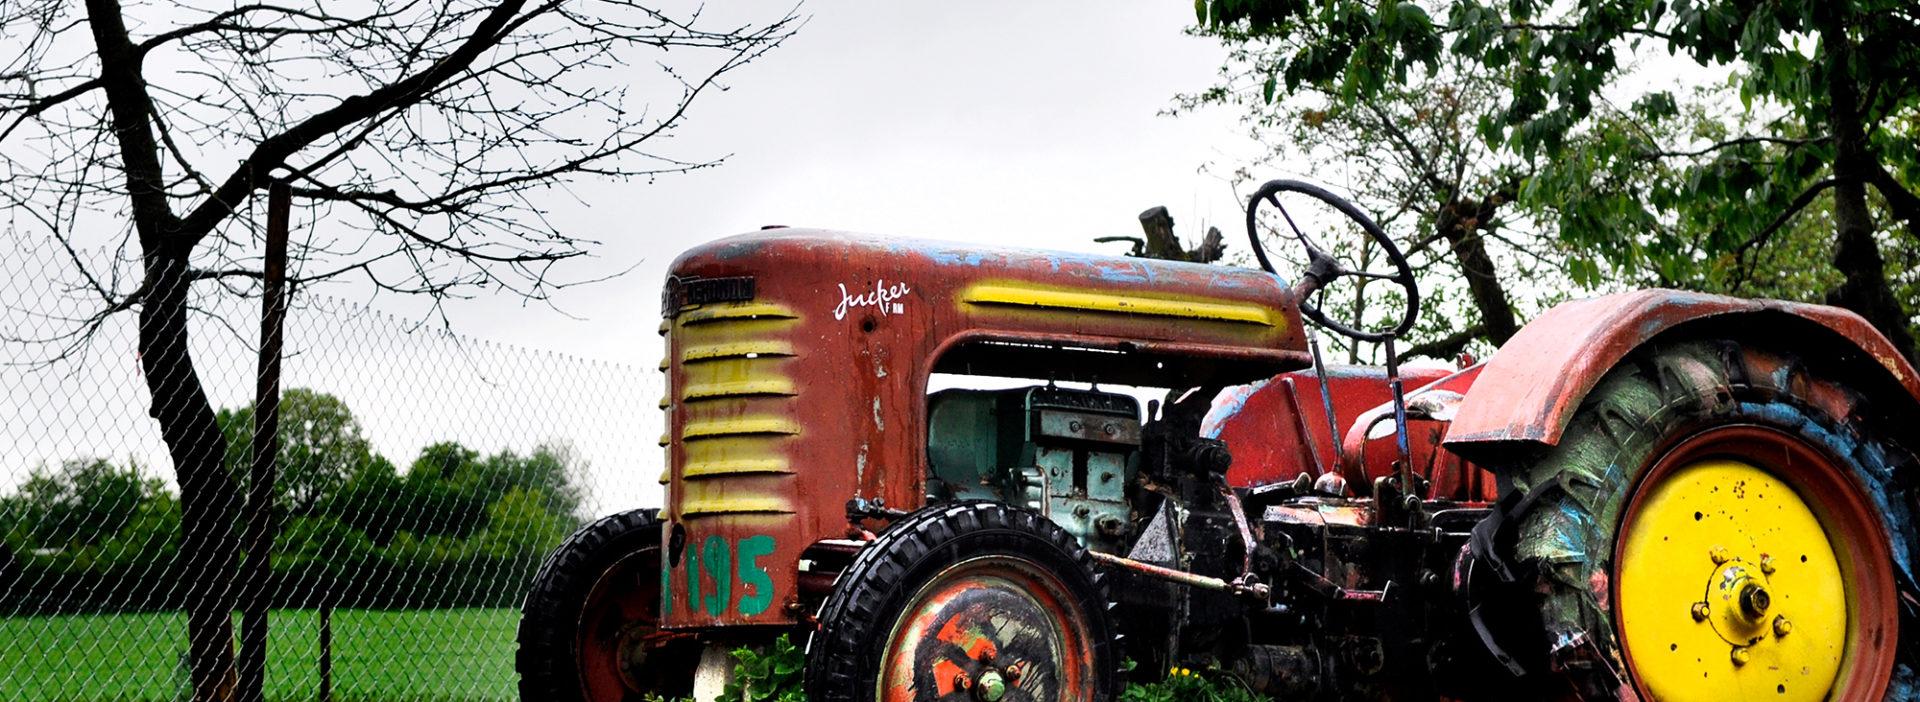 Traktor Juckerhof HofAkademie